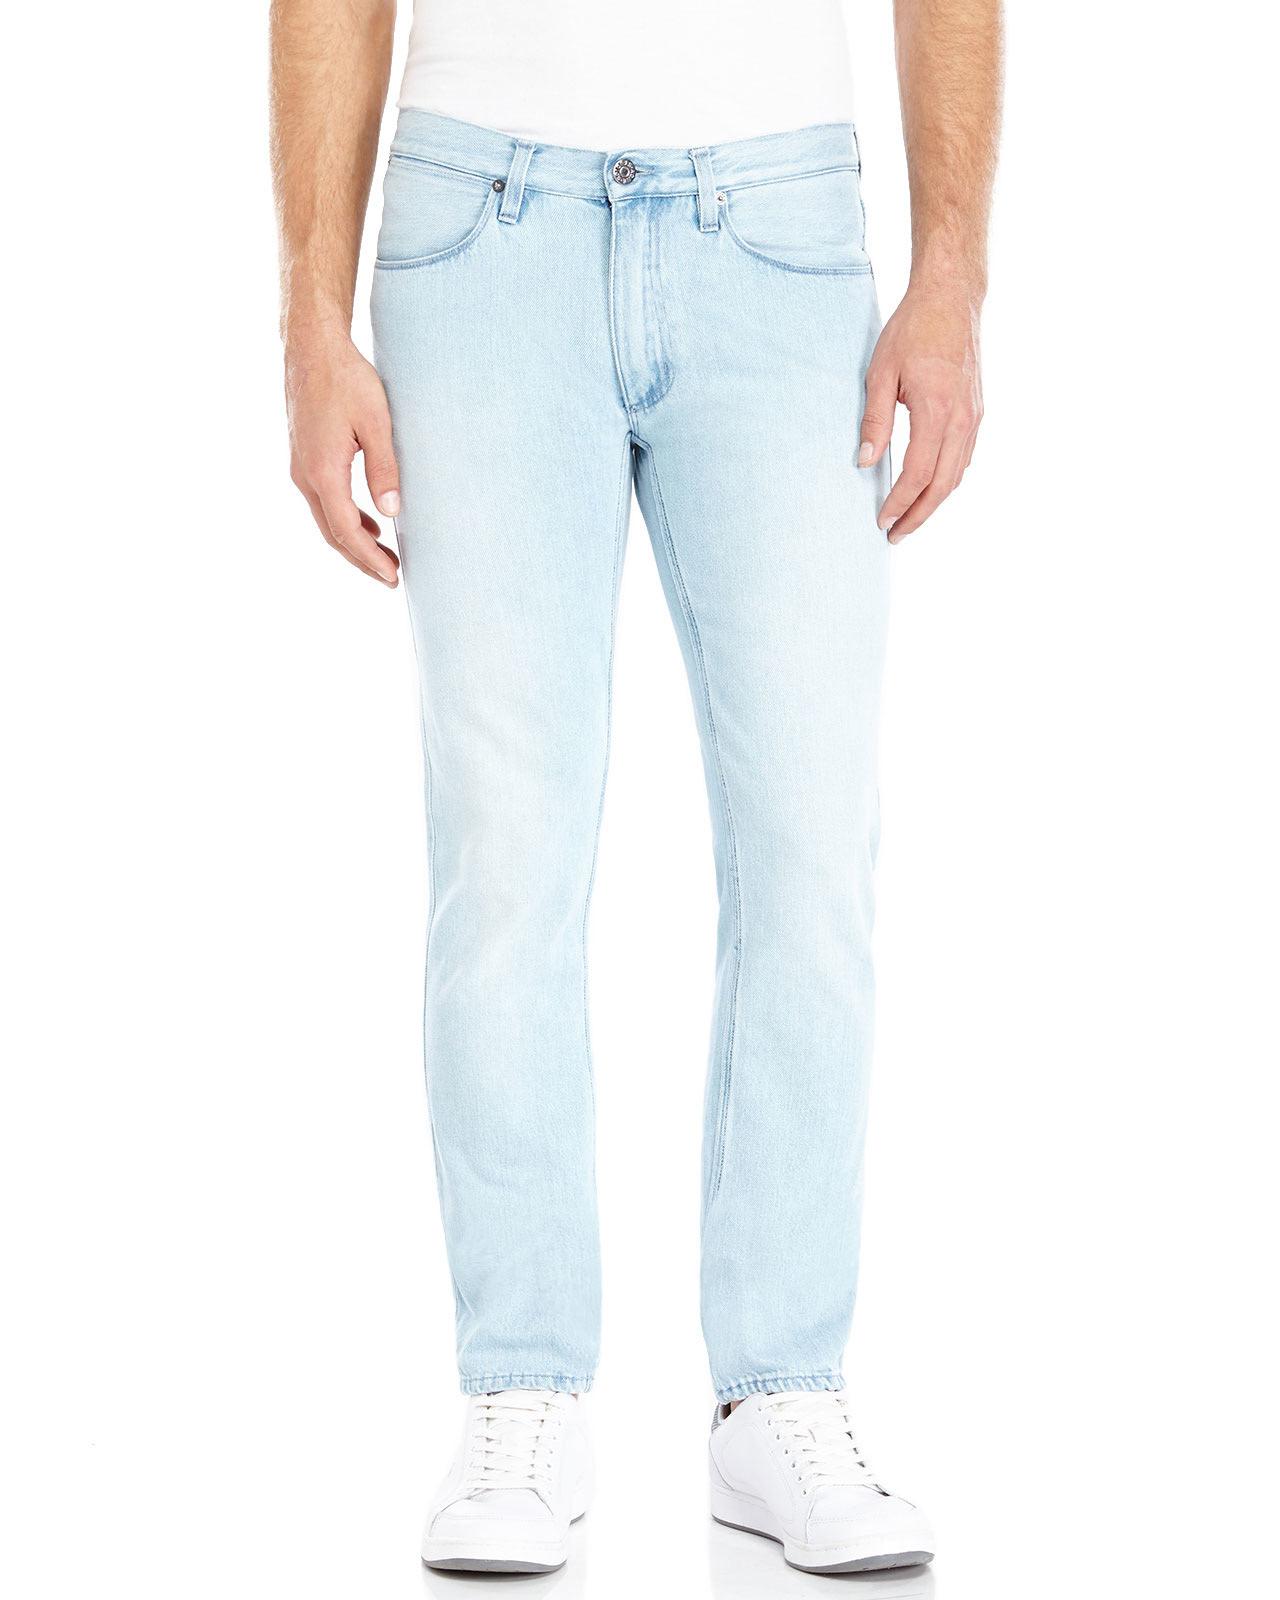 0fcf7eac728 Acne Studios Light Wash Max Flash Slim Fit Jeans in Blue for Men - Lyst